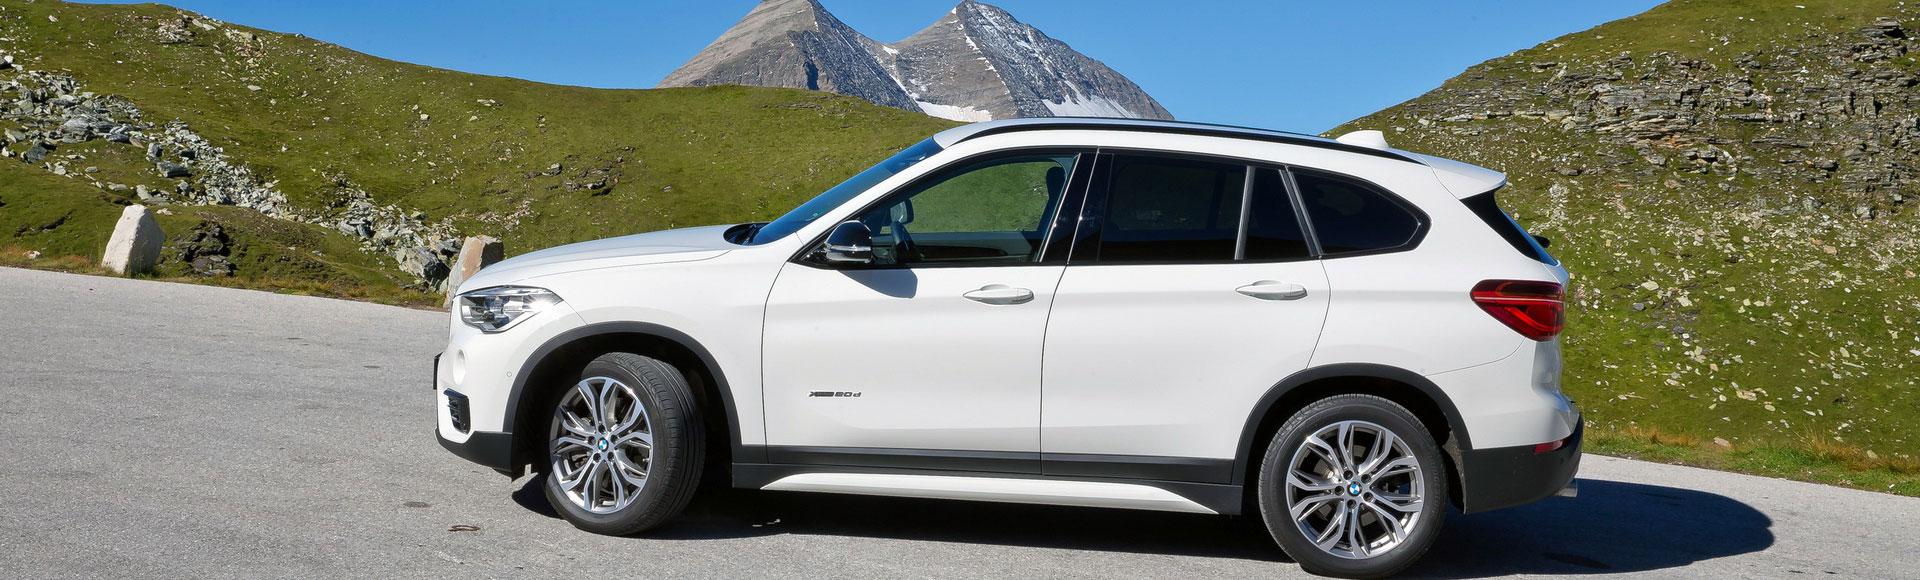 BMW X1 2016 098 Sommer Herbst